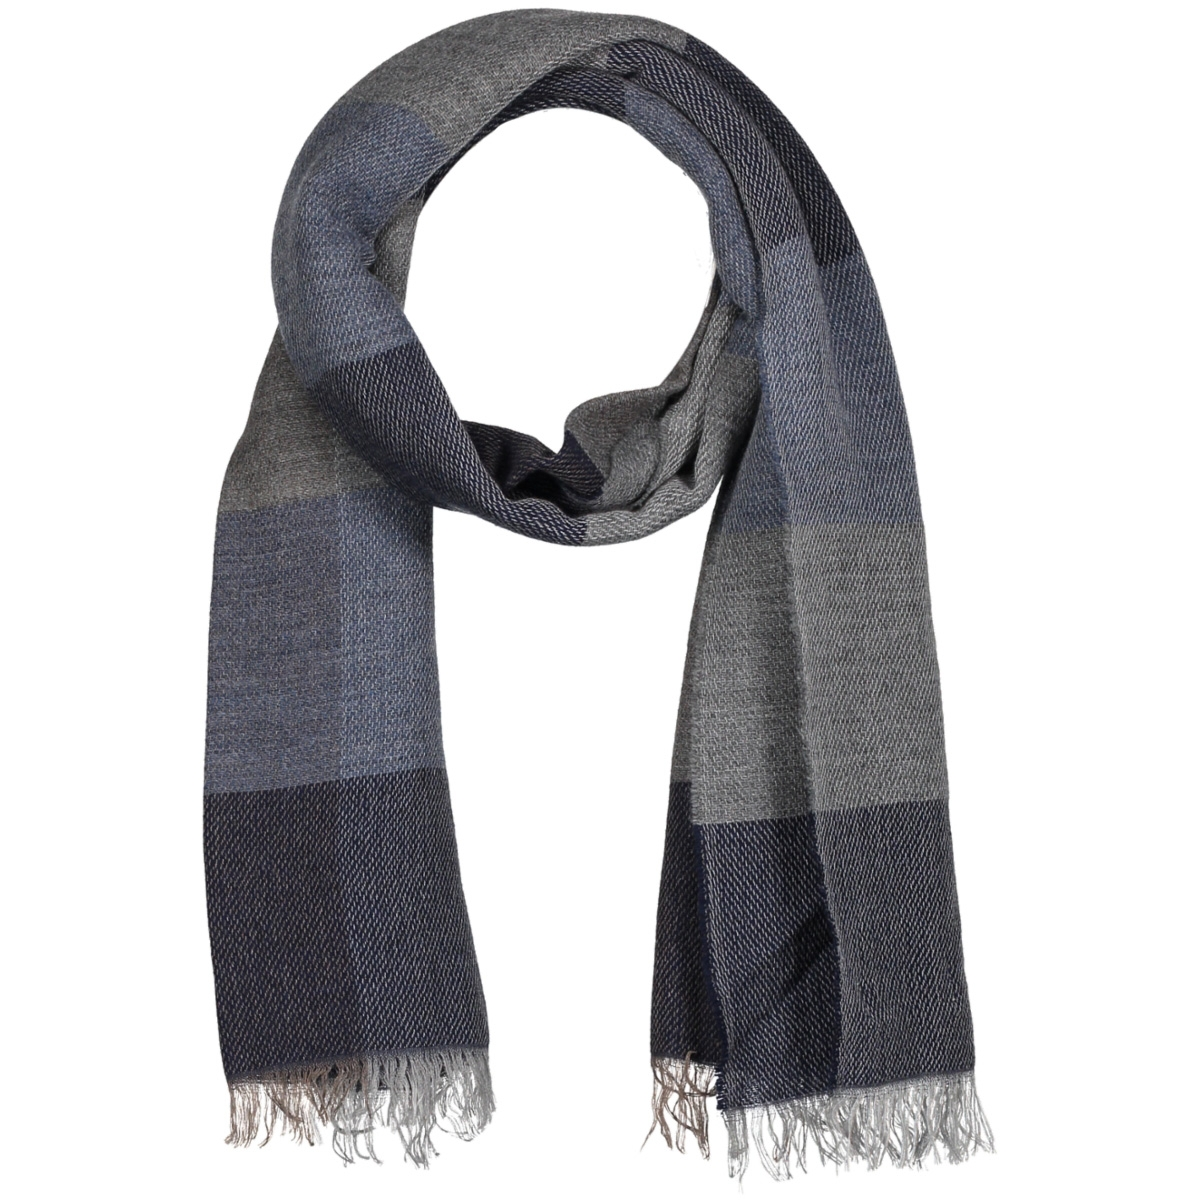 825-17531 state of art sjaal 5992